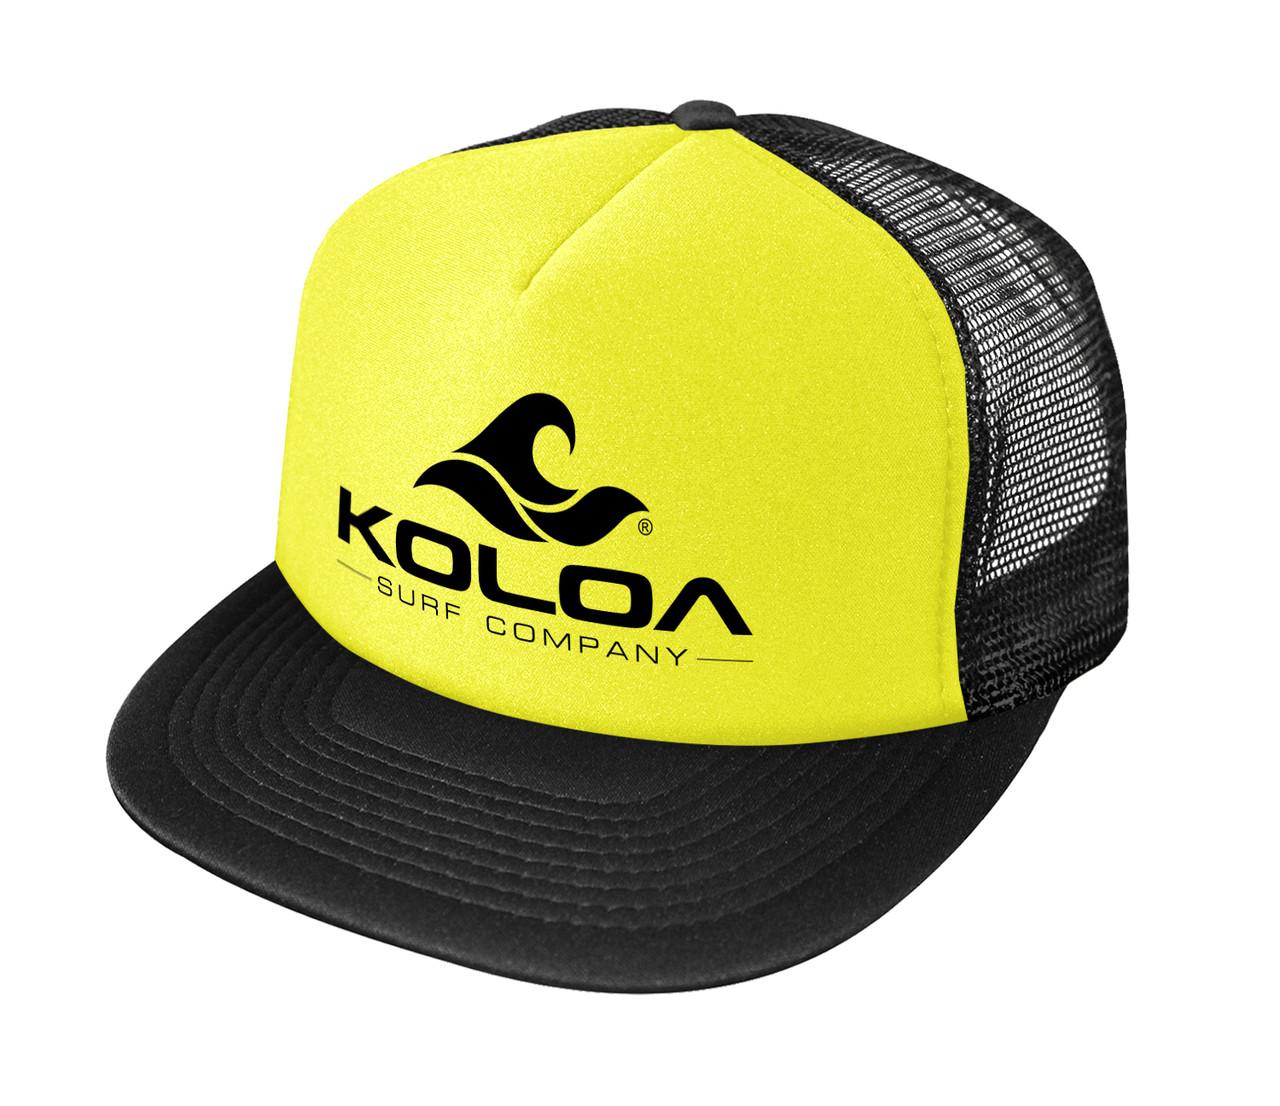 70d4b4fd30f5 Koloa Surf Co. Wave Logo Poly-Foam Mesh Snapback High Profile ...